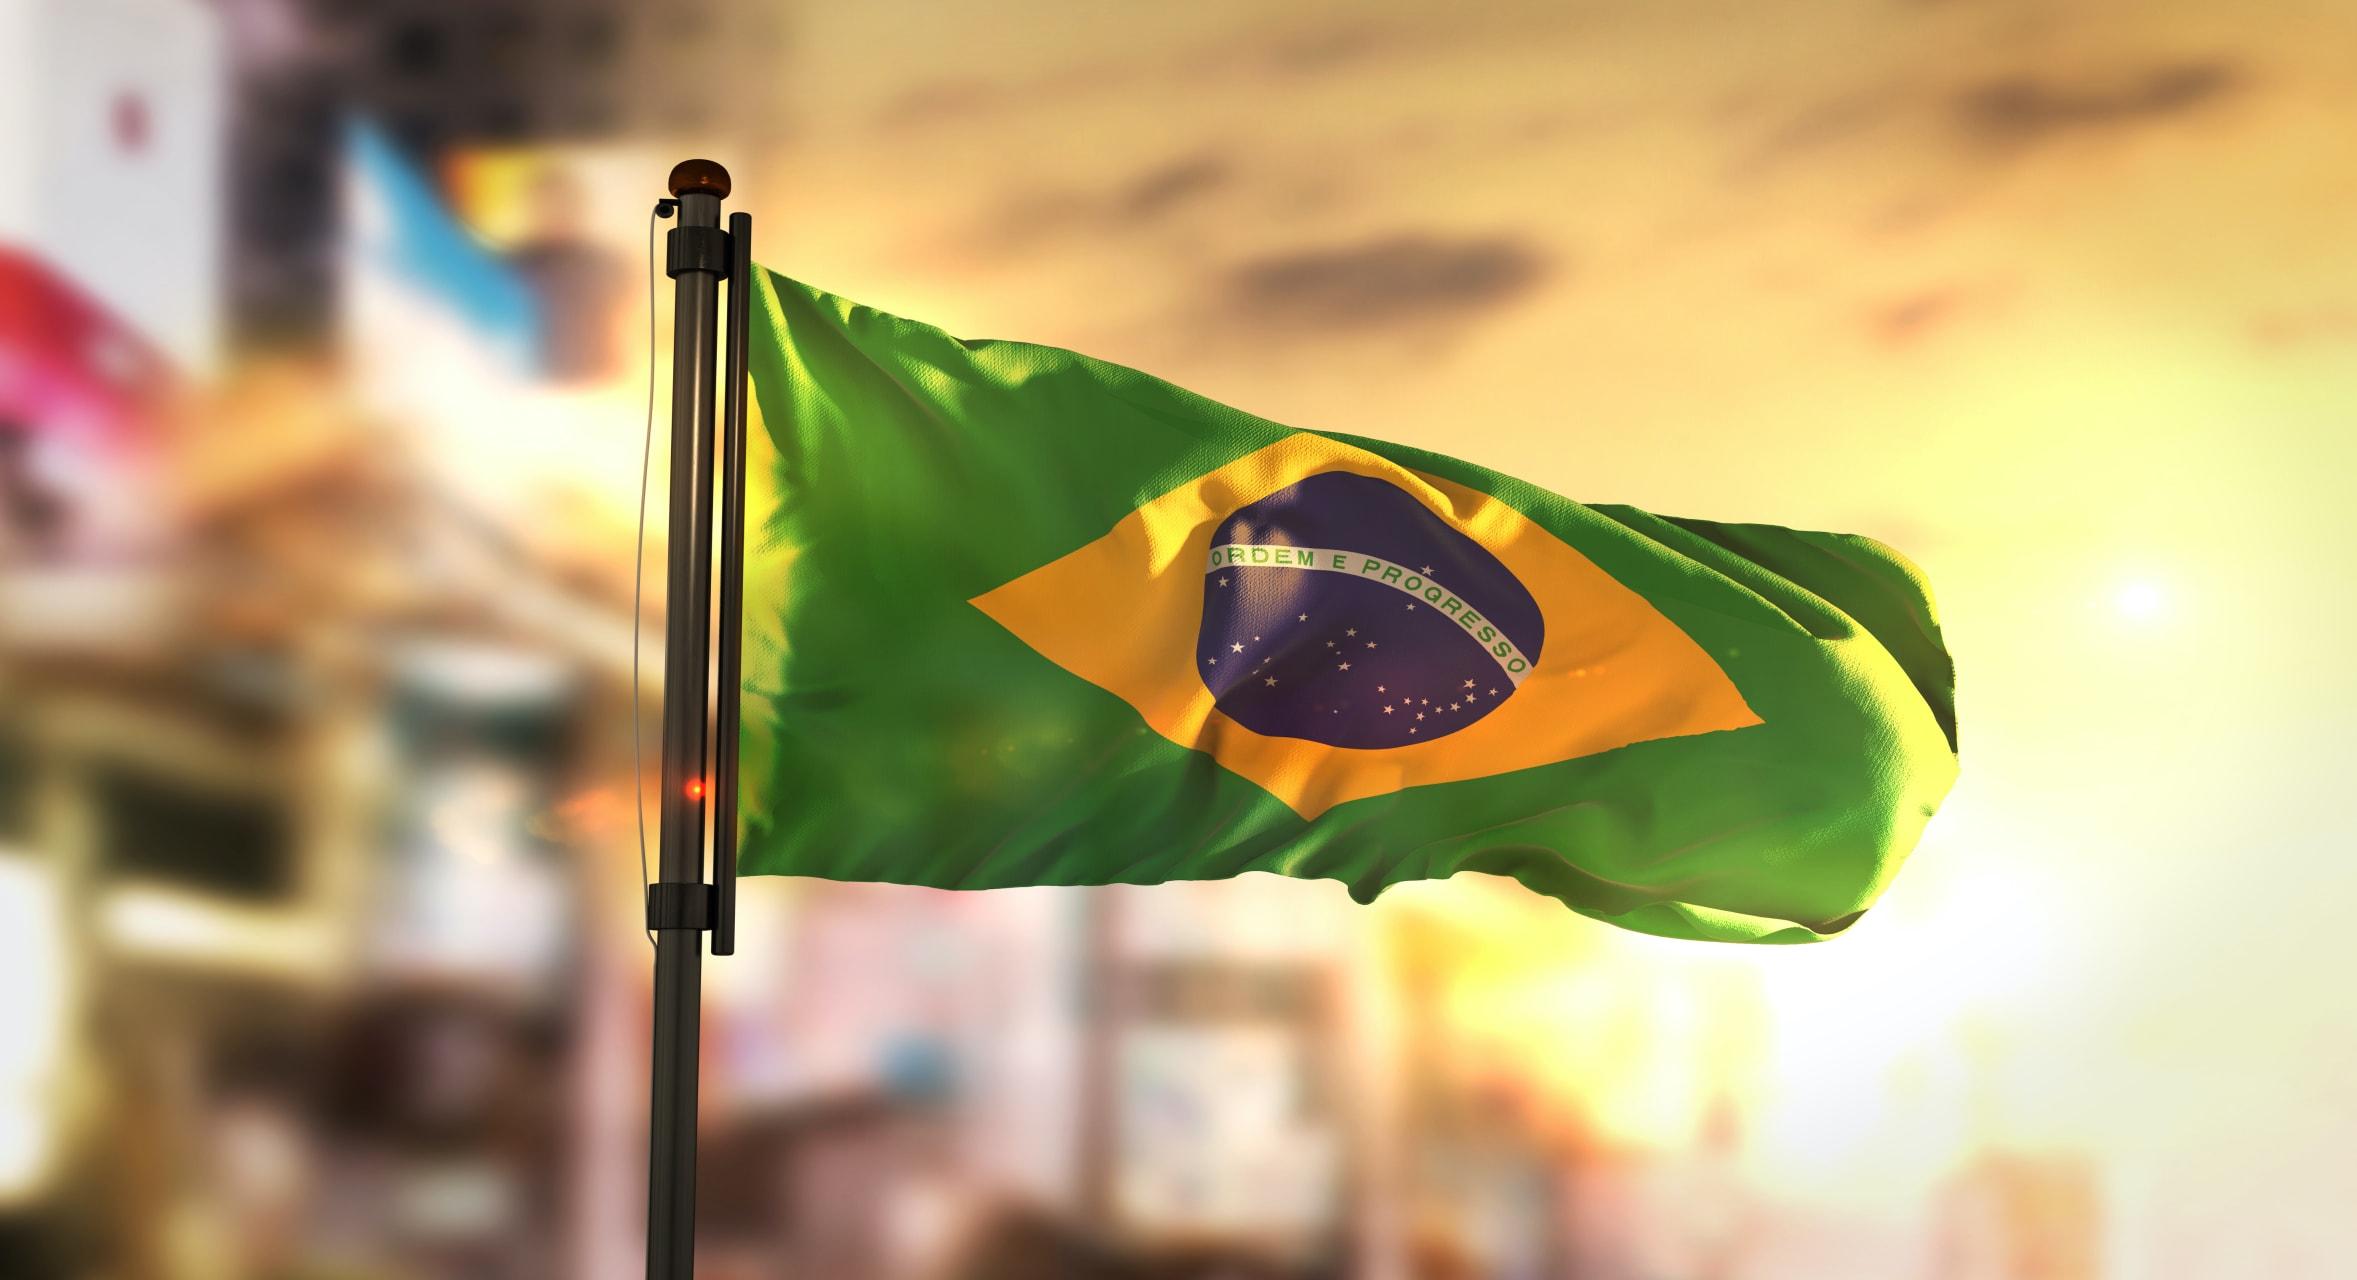 Rio de Janeiro - Travel Around Brazil with Tati - SURPRISE TOUR!